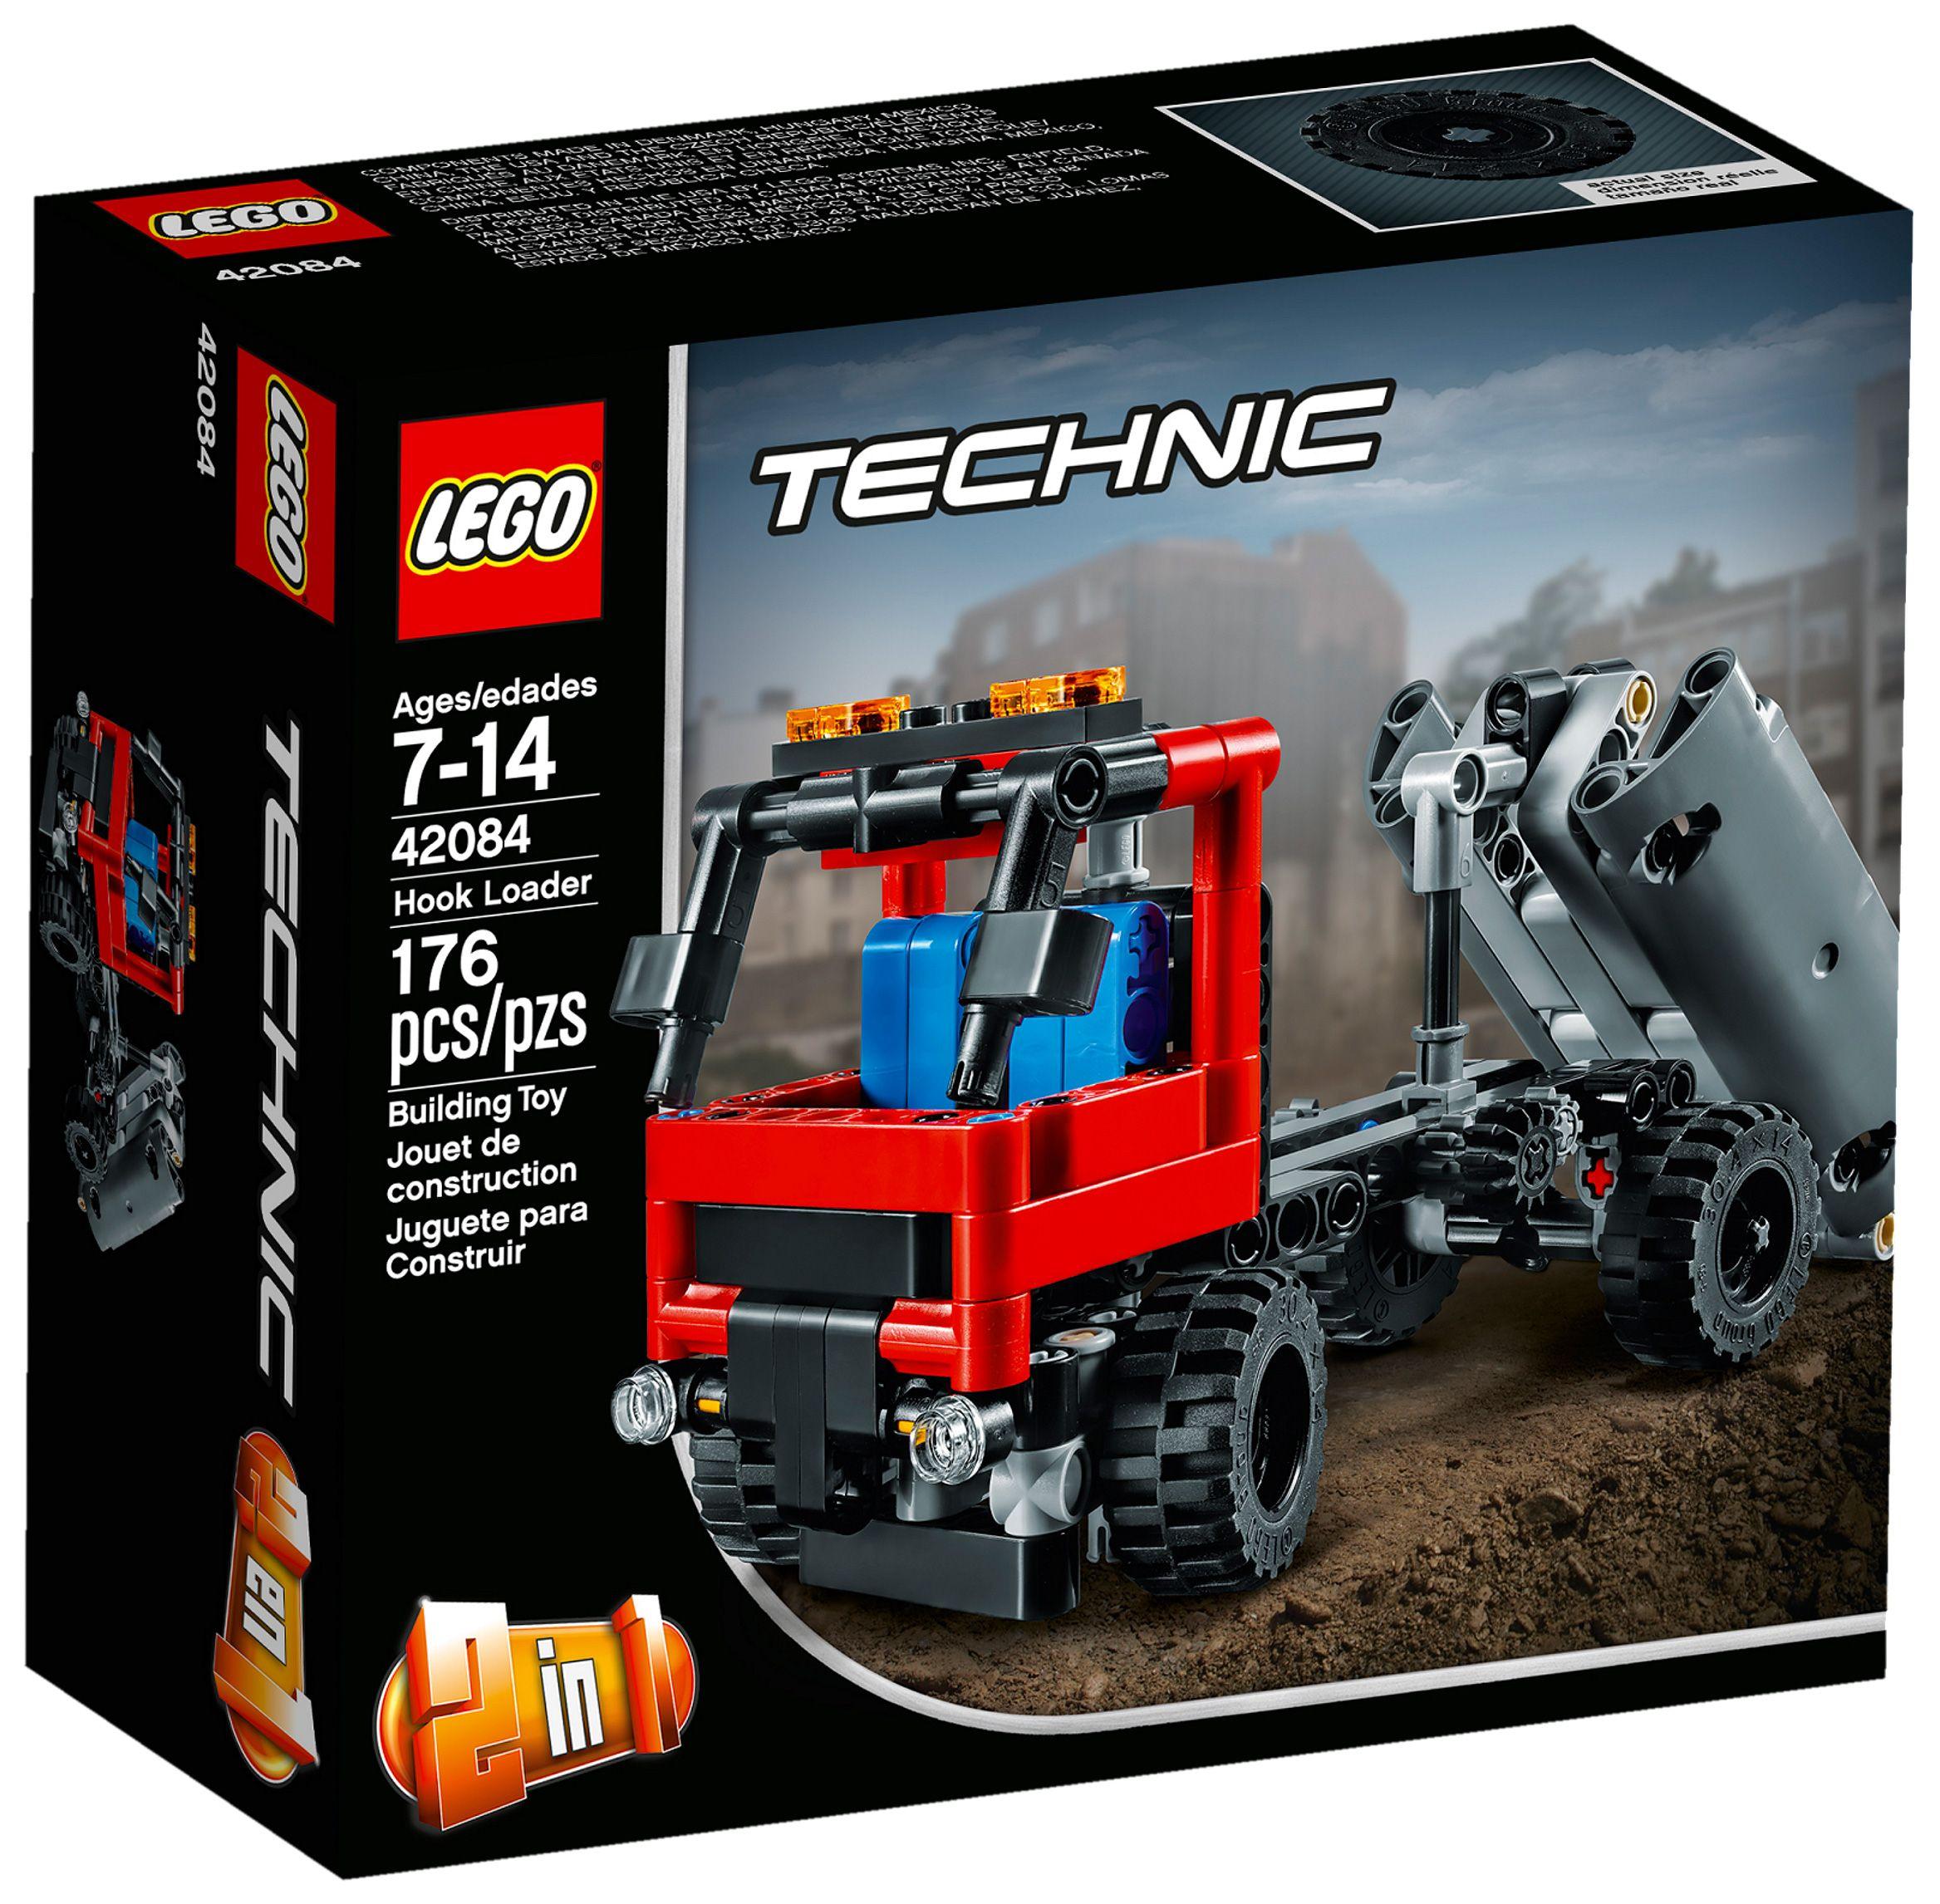 Lego Technic 42084 Le Camion à Crochet Lego Lego Technic Lego